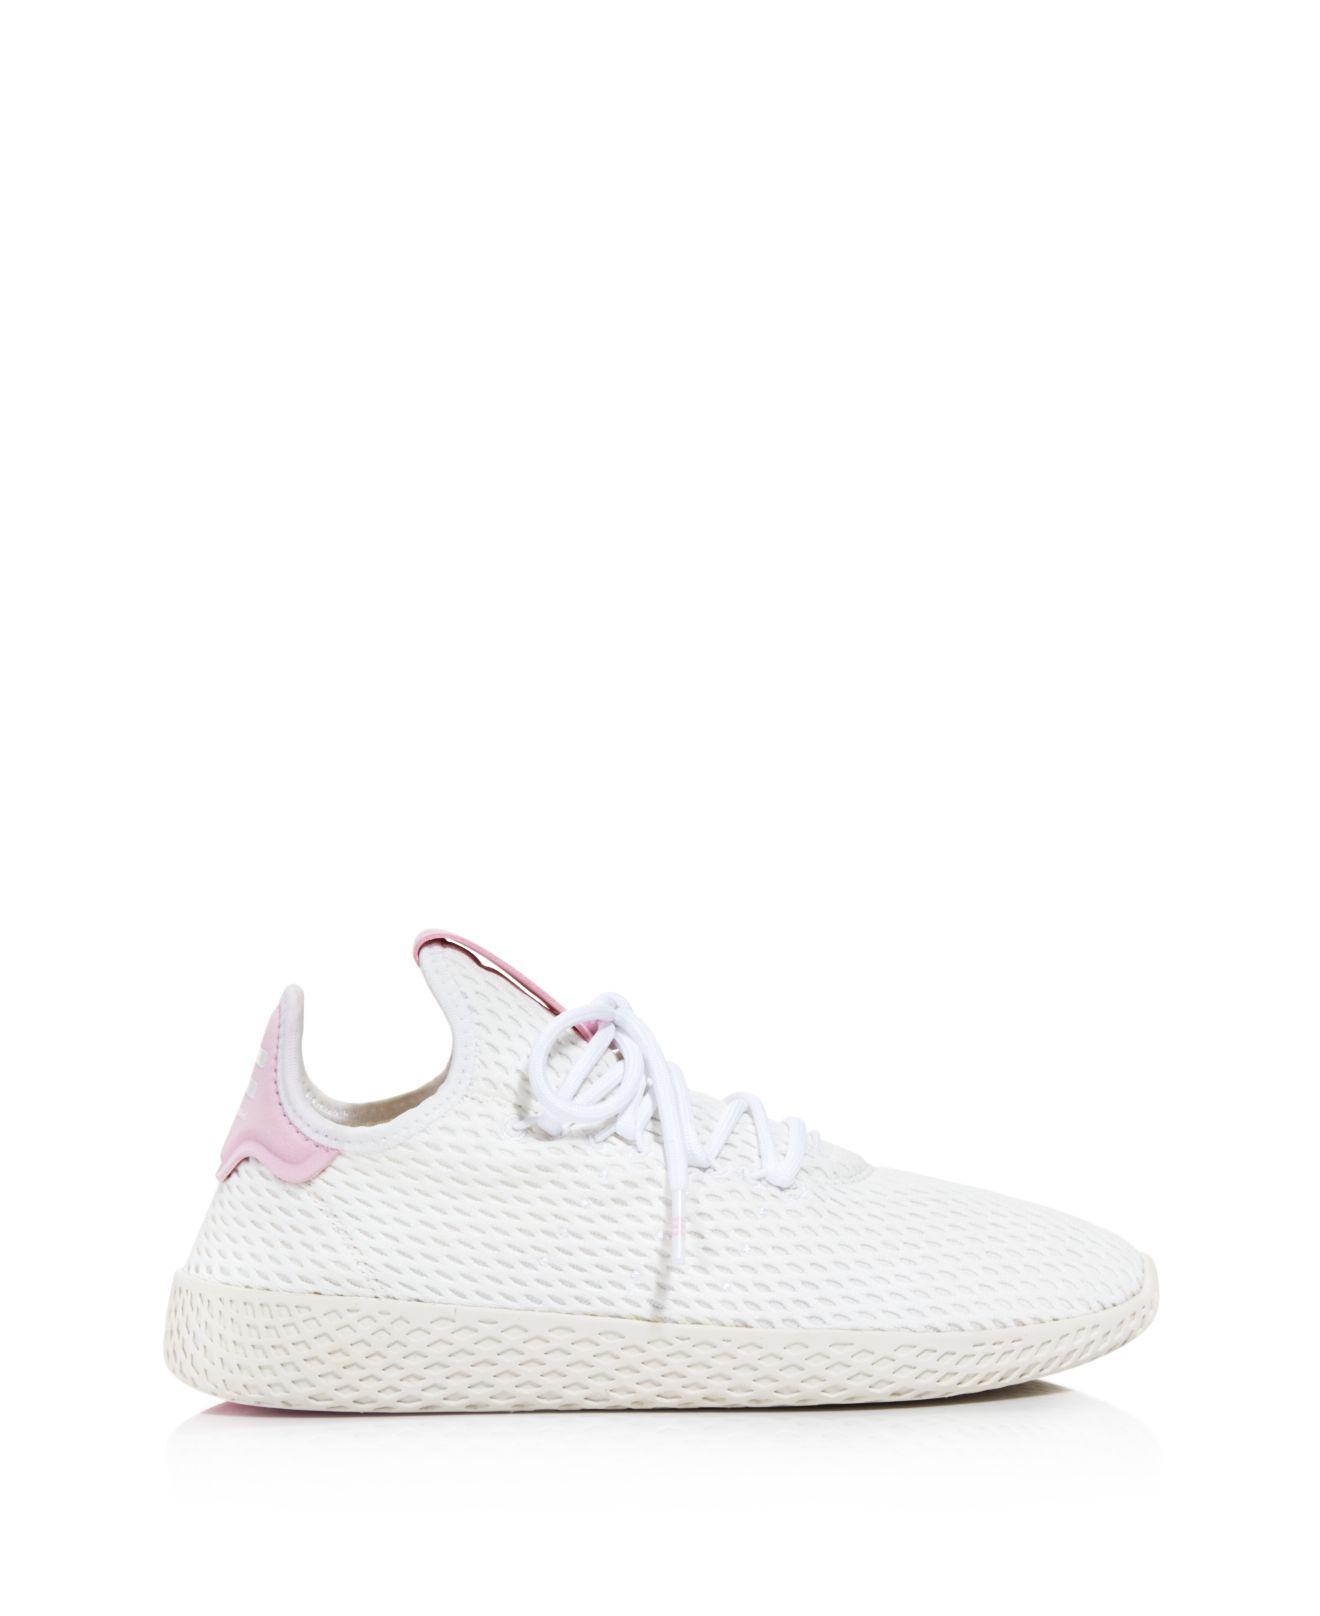 vino rosso pharrell williams x adidas tennis hu scarpe canada